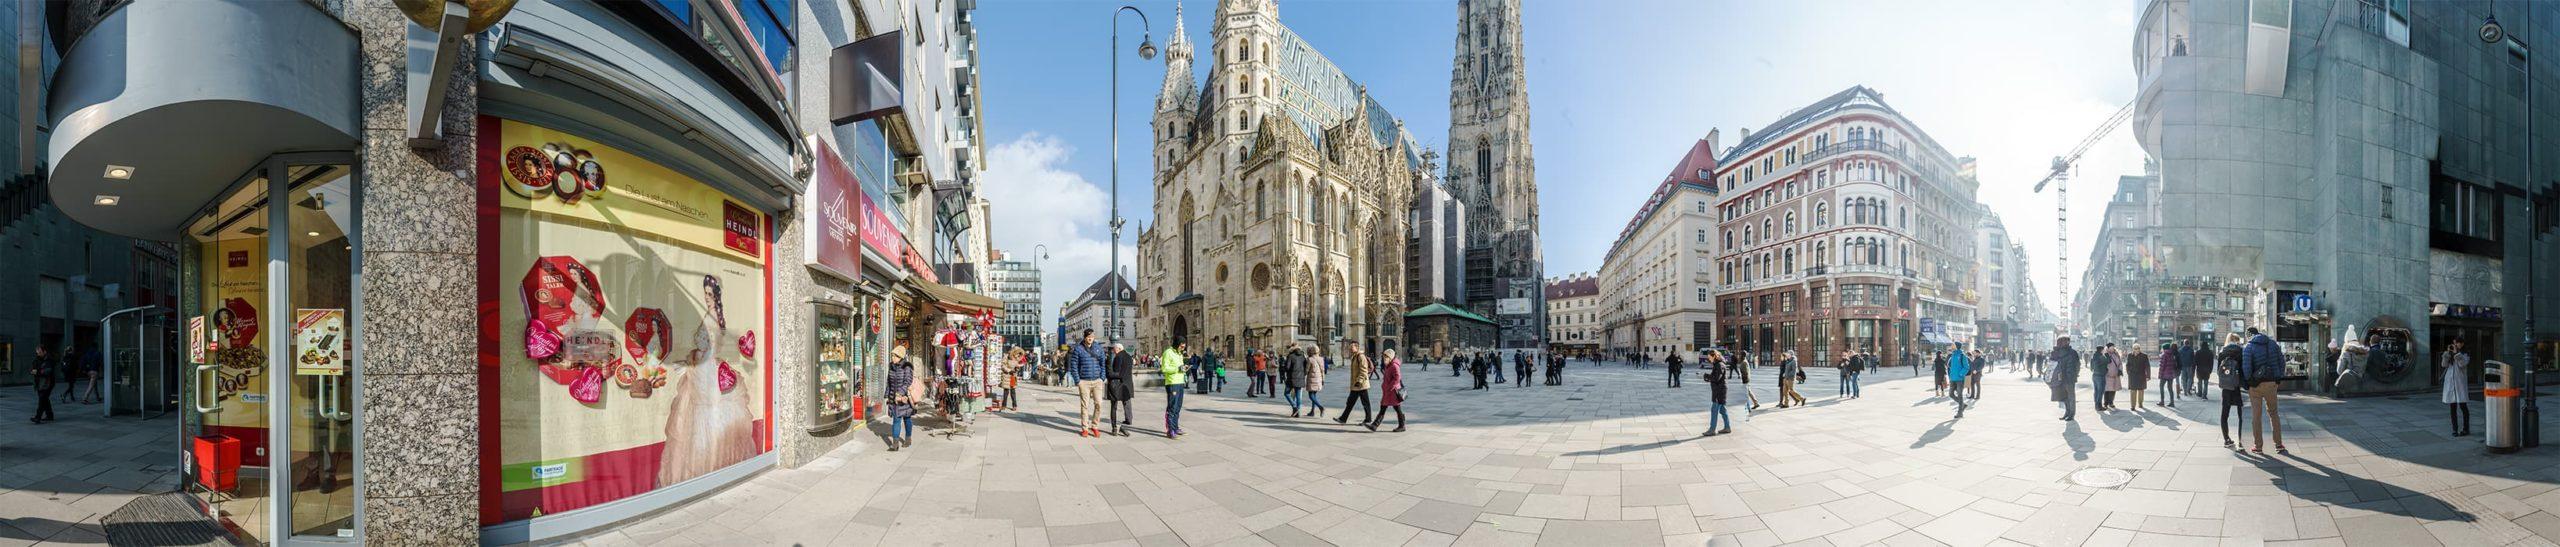 wien-panorama-stephansplatz